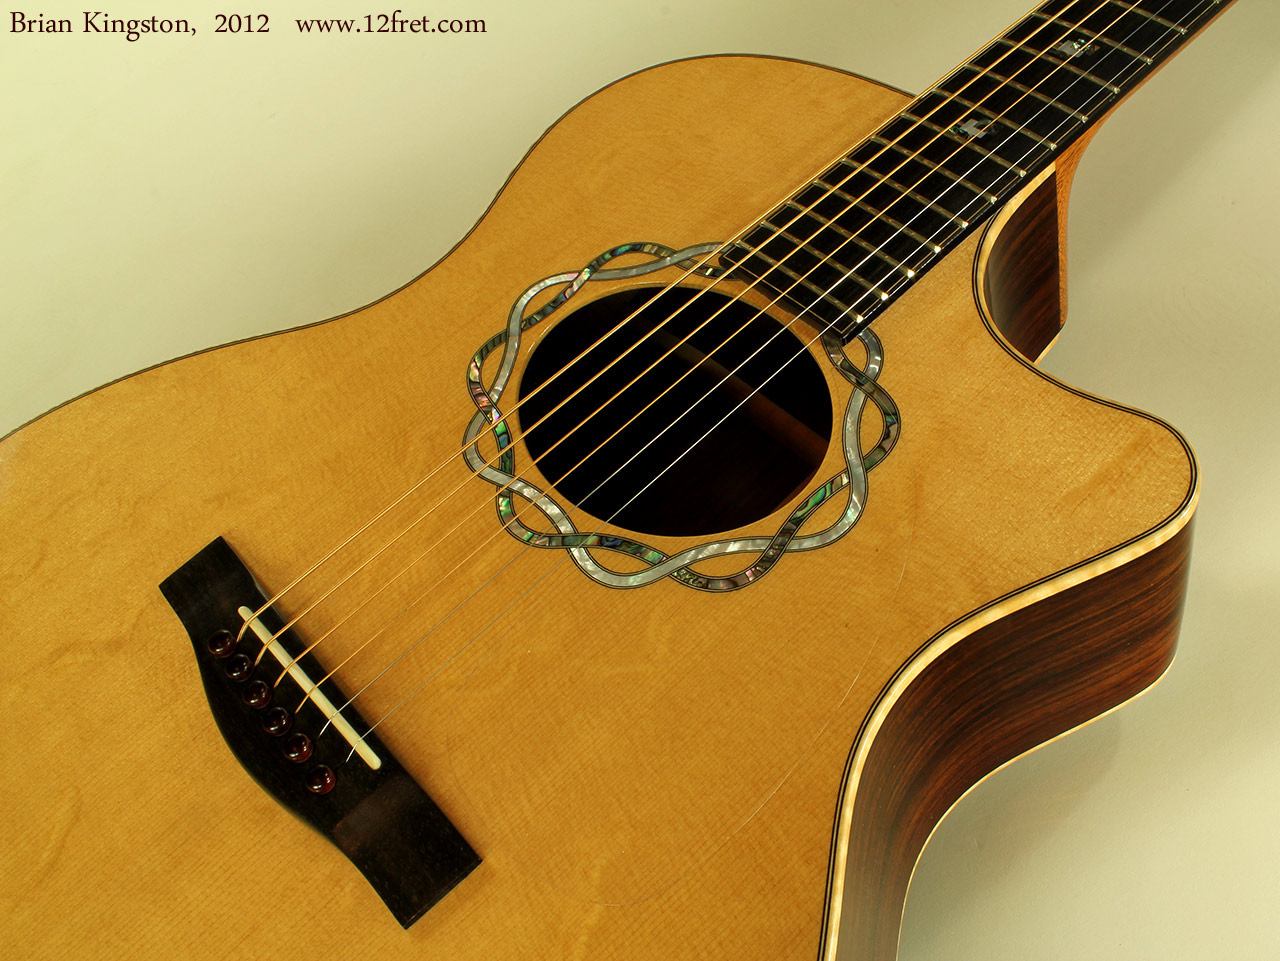 Brian Kingston Cutaway Acoustic 2012 rosette